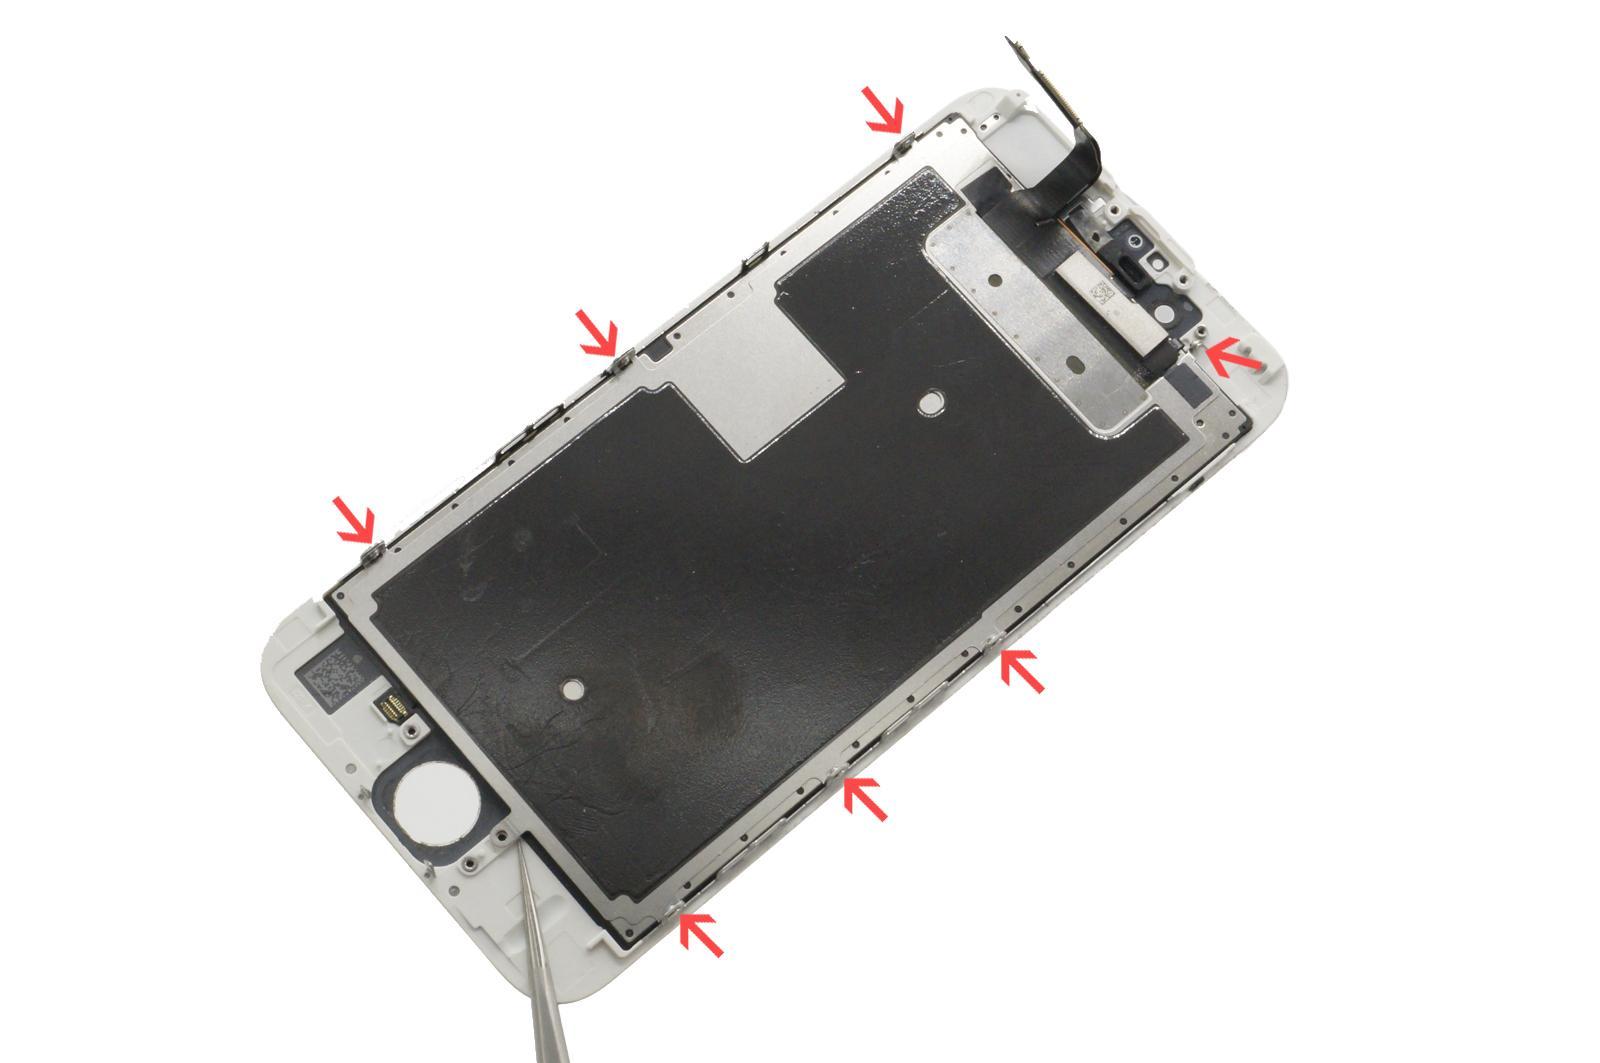 снимаем дисплей iPhone 6S с защитных рамок